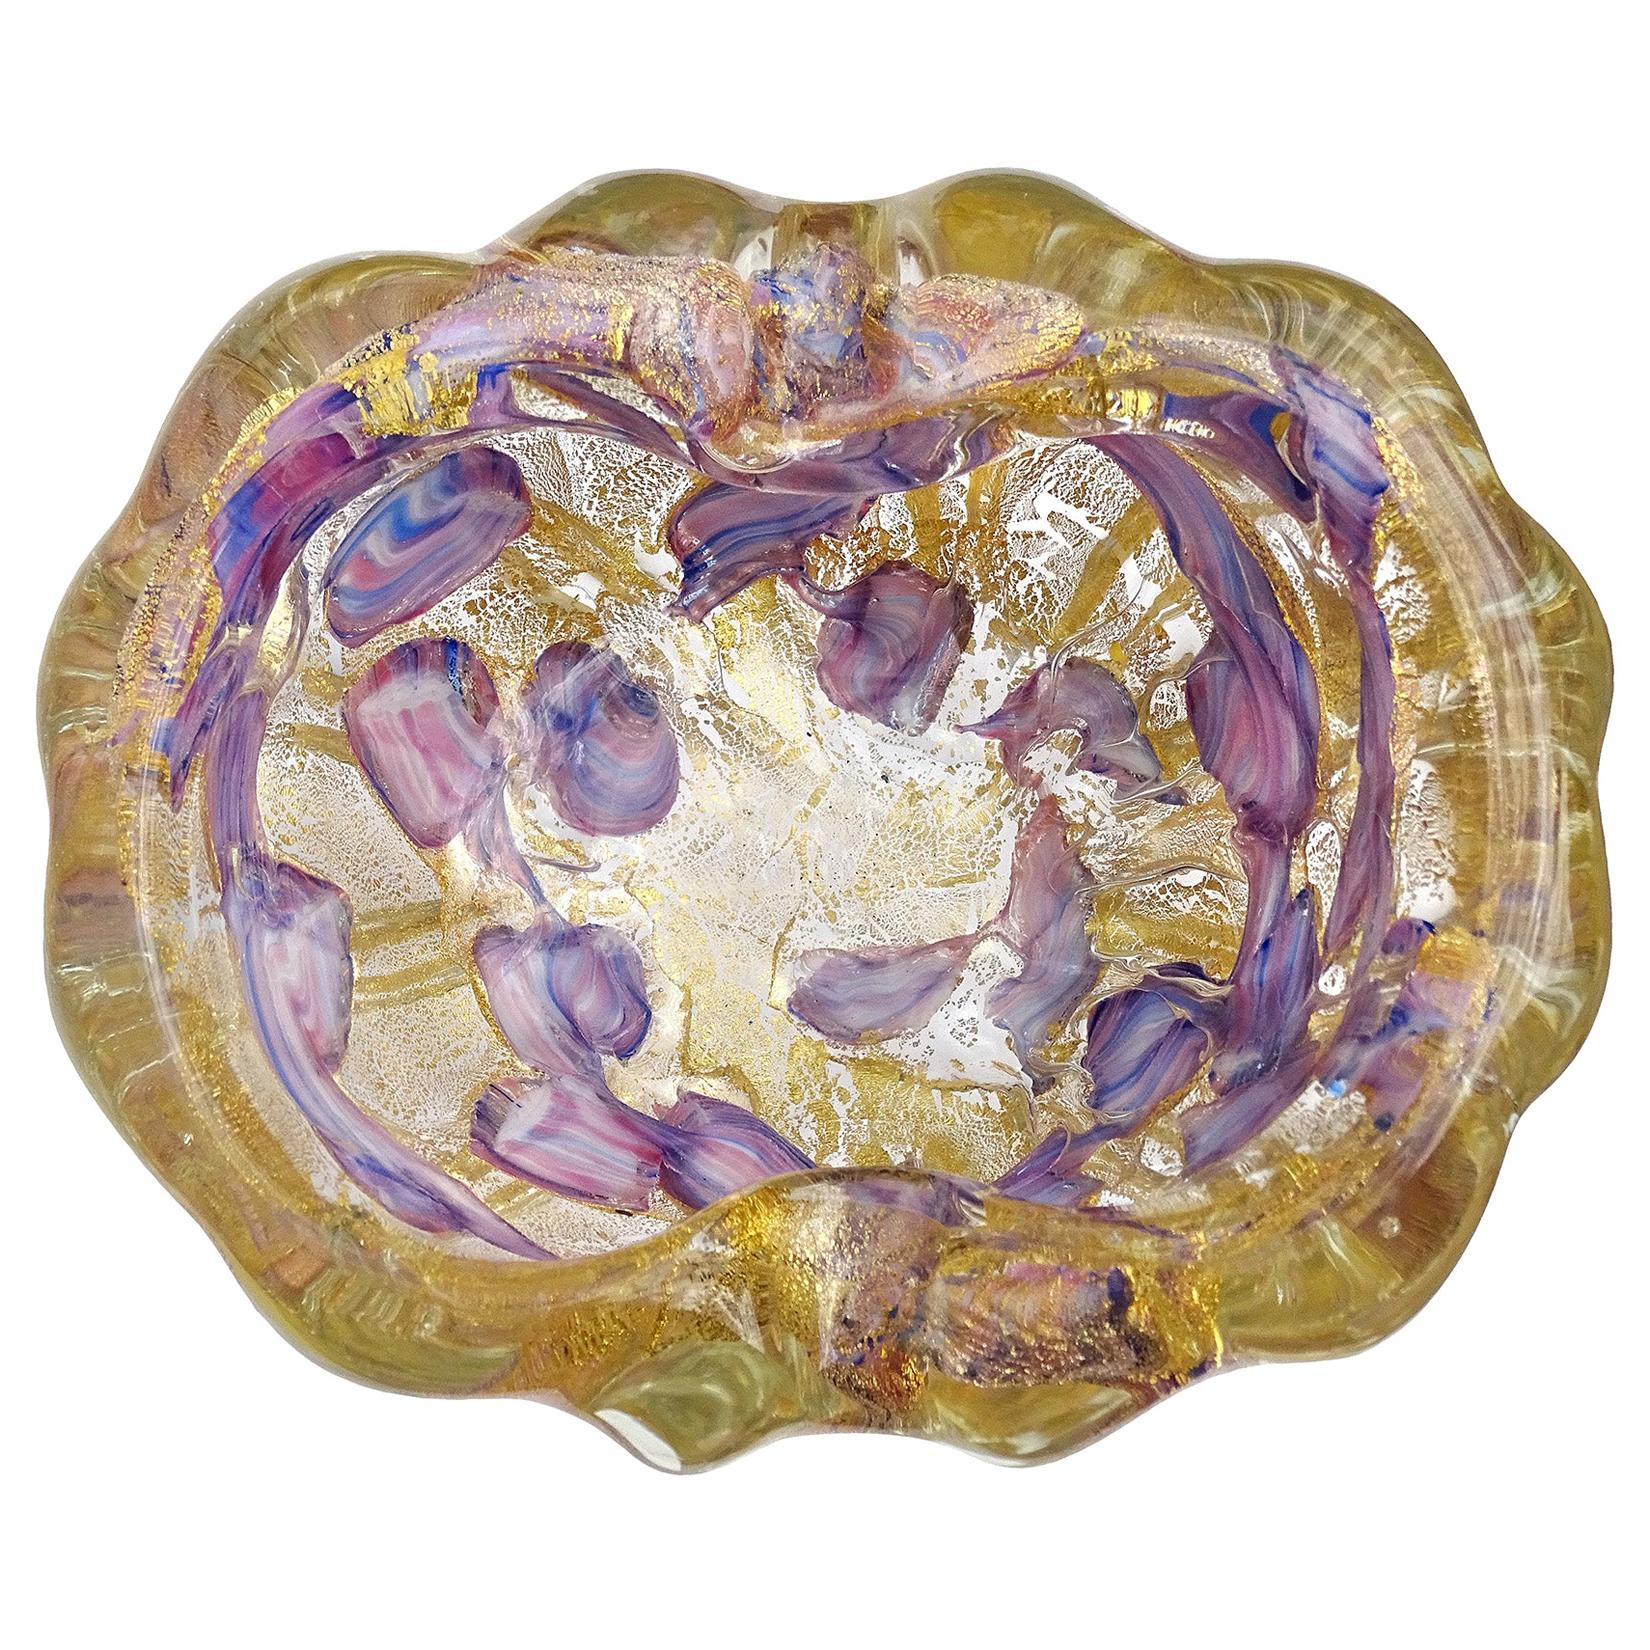 Barovier Toso Murano Gold Flecks Purple Blue Spots Italian Art Glass Bowl